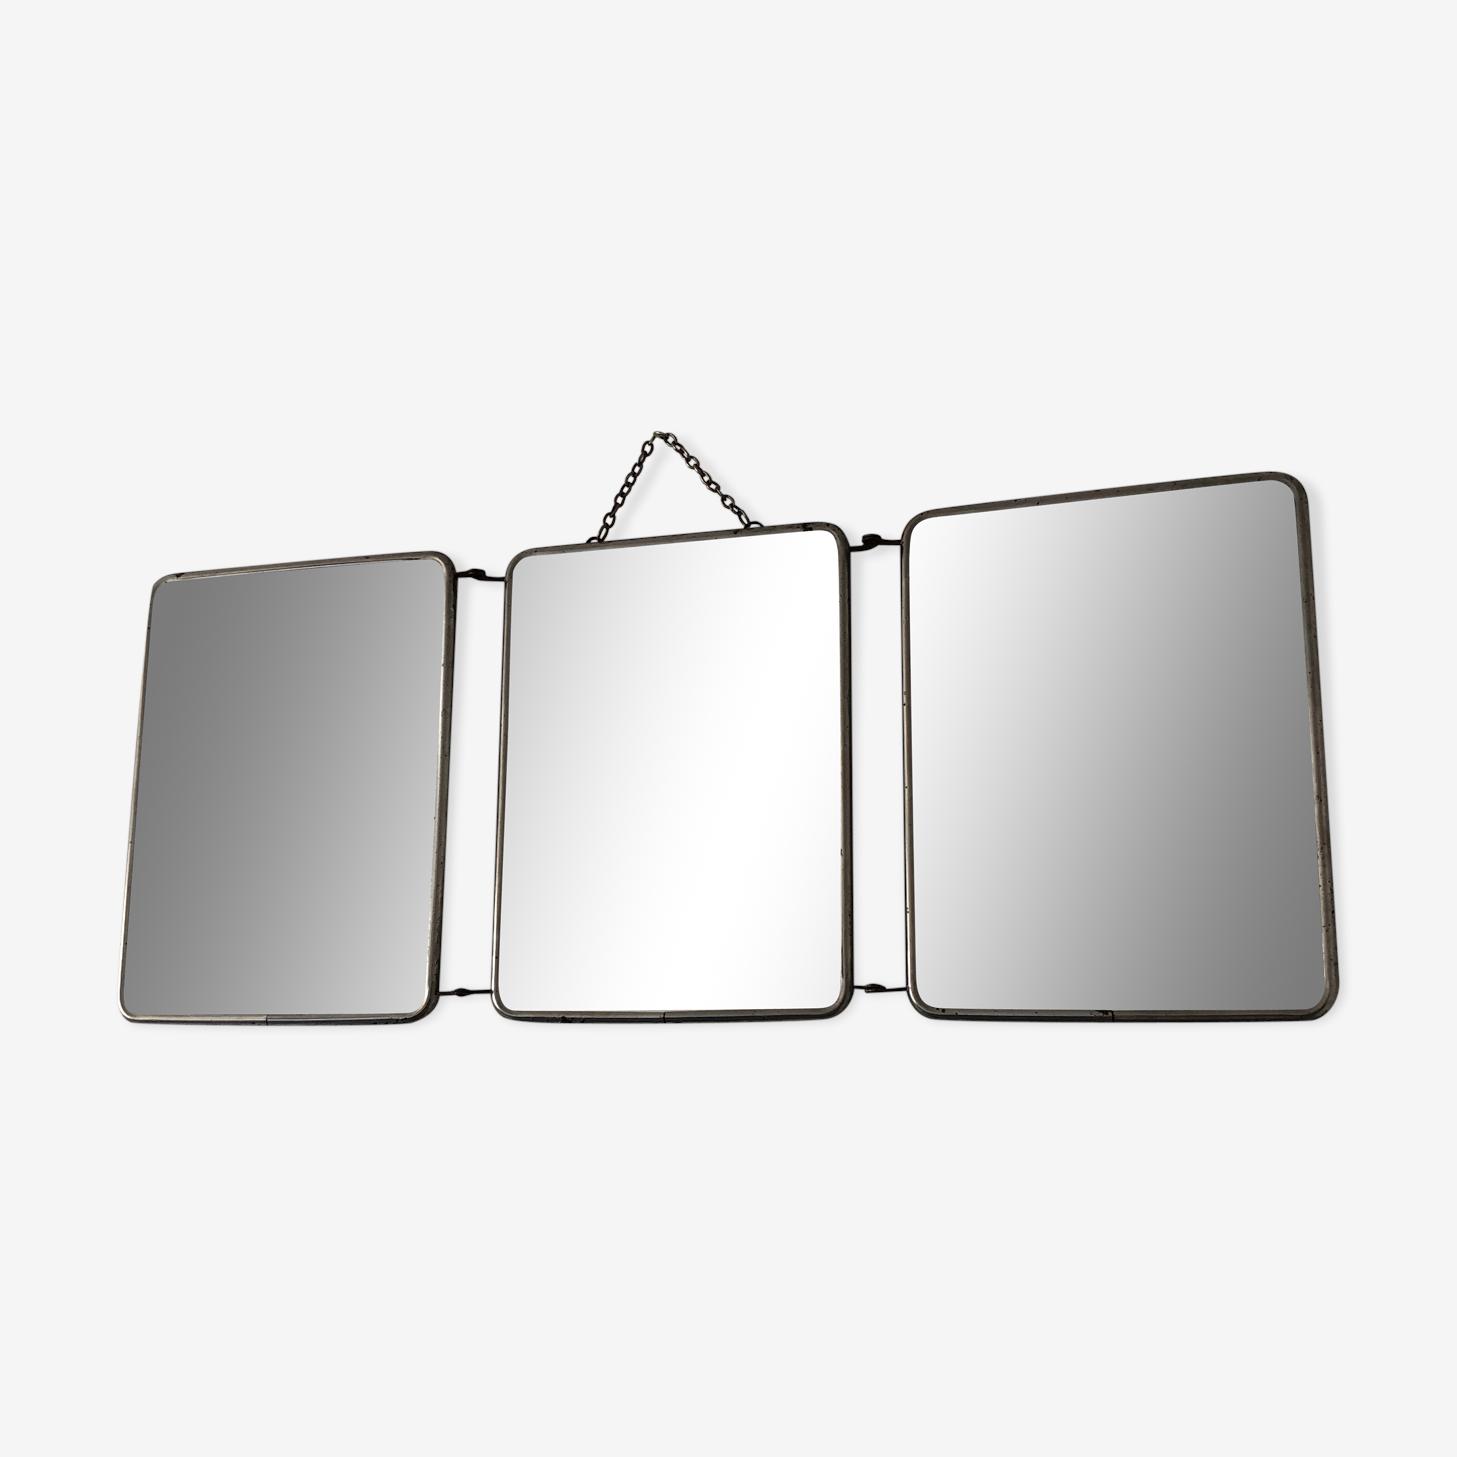 Barber mirror 1960 24x59cm